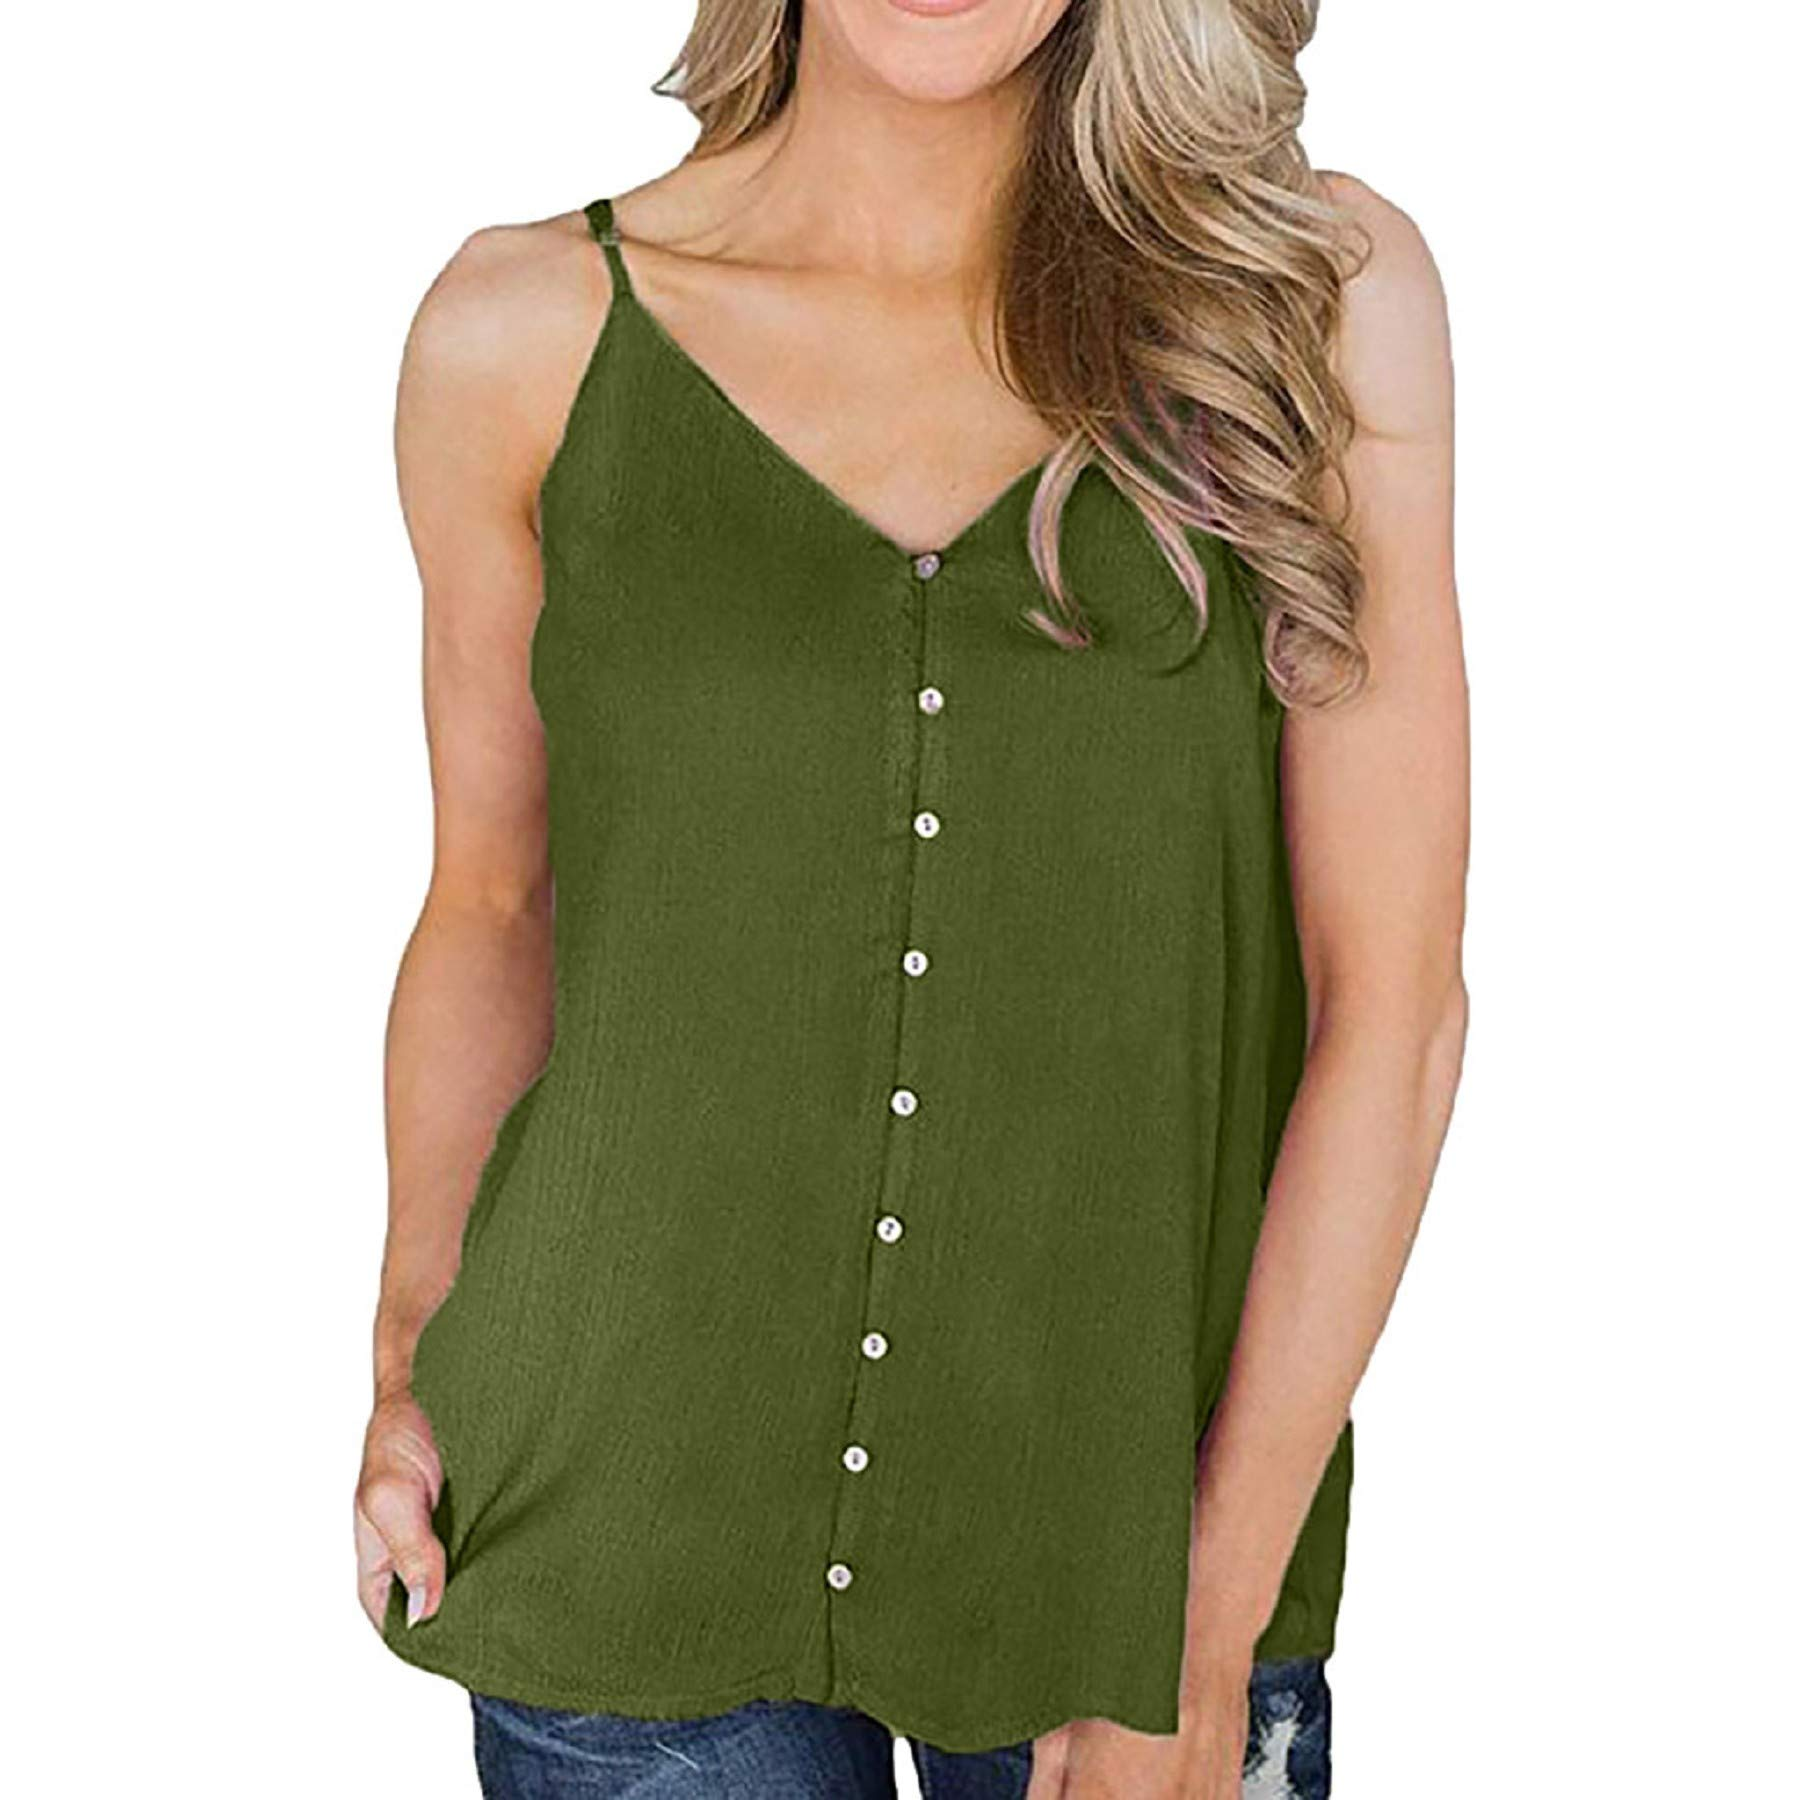 Women's Casual Summer Sleeveless Spaghetti Strap Button Tank Top Ladies Fashion V Neck Vest Top Blouse Green